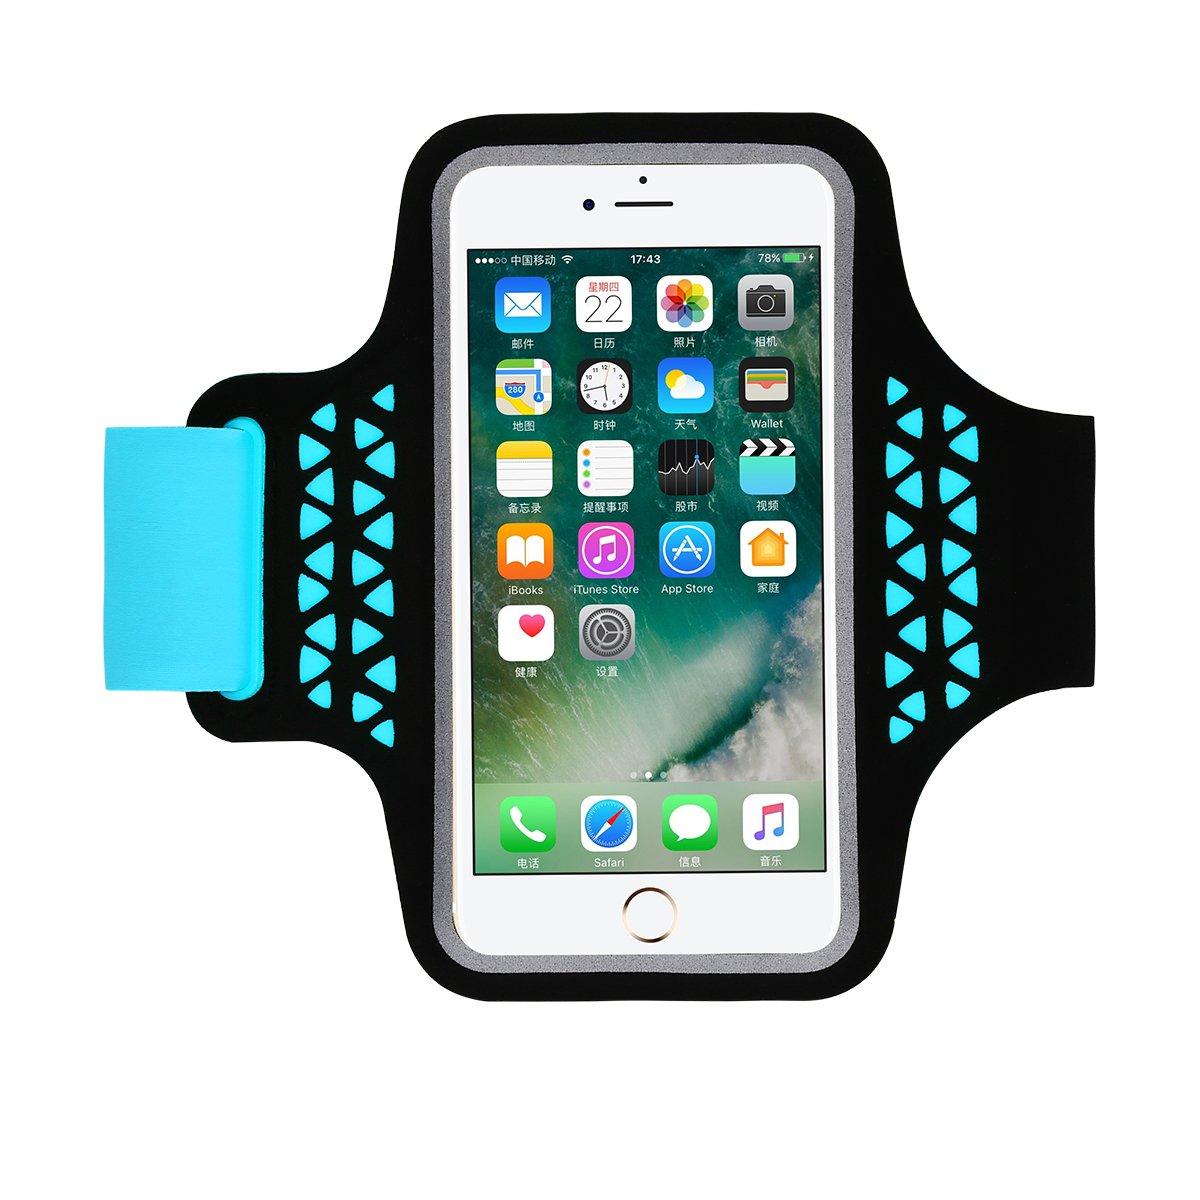 Correa de Brazalete Brazalete Deportivo para Correr Brazalete M/óvil Deportivo Ajustable para iPhone 11 Pro MAX XS MAX XR X Samsung Huawei Ideal para Correr Andar en Bicicleta Senderismo